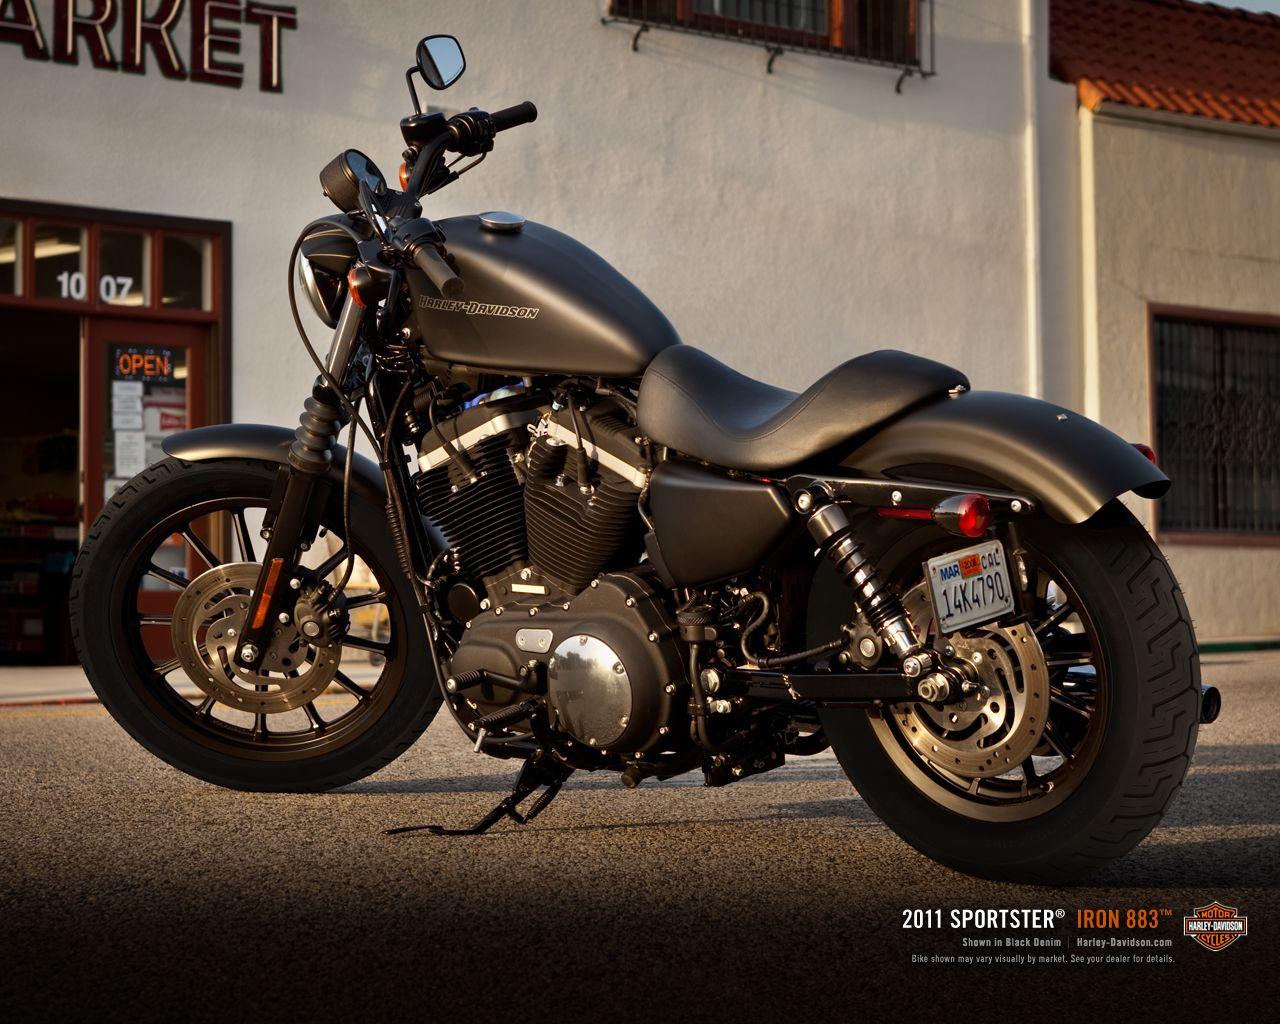 Harley davidson motor company harley davidson motor for Harley davidson motor co